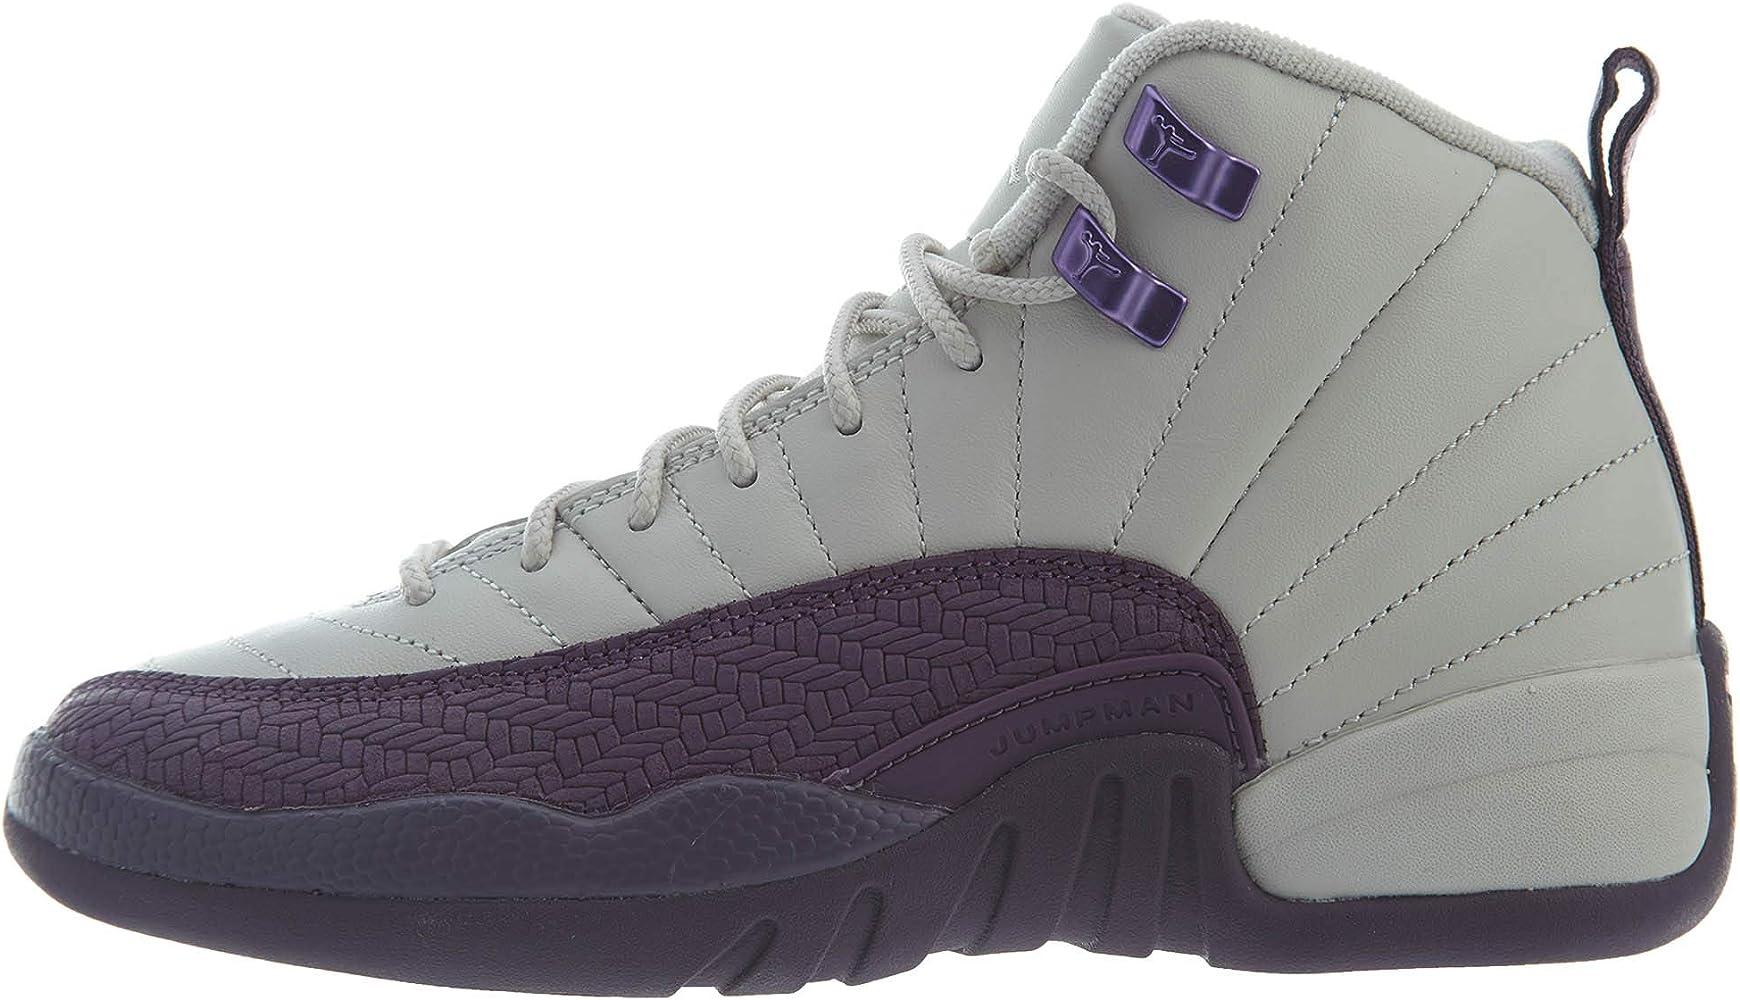 Nike Air Jordan 12 Retro GS Kids